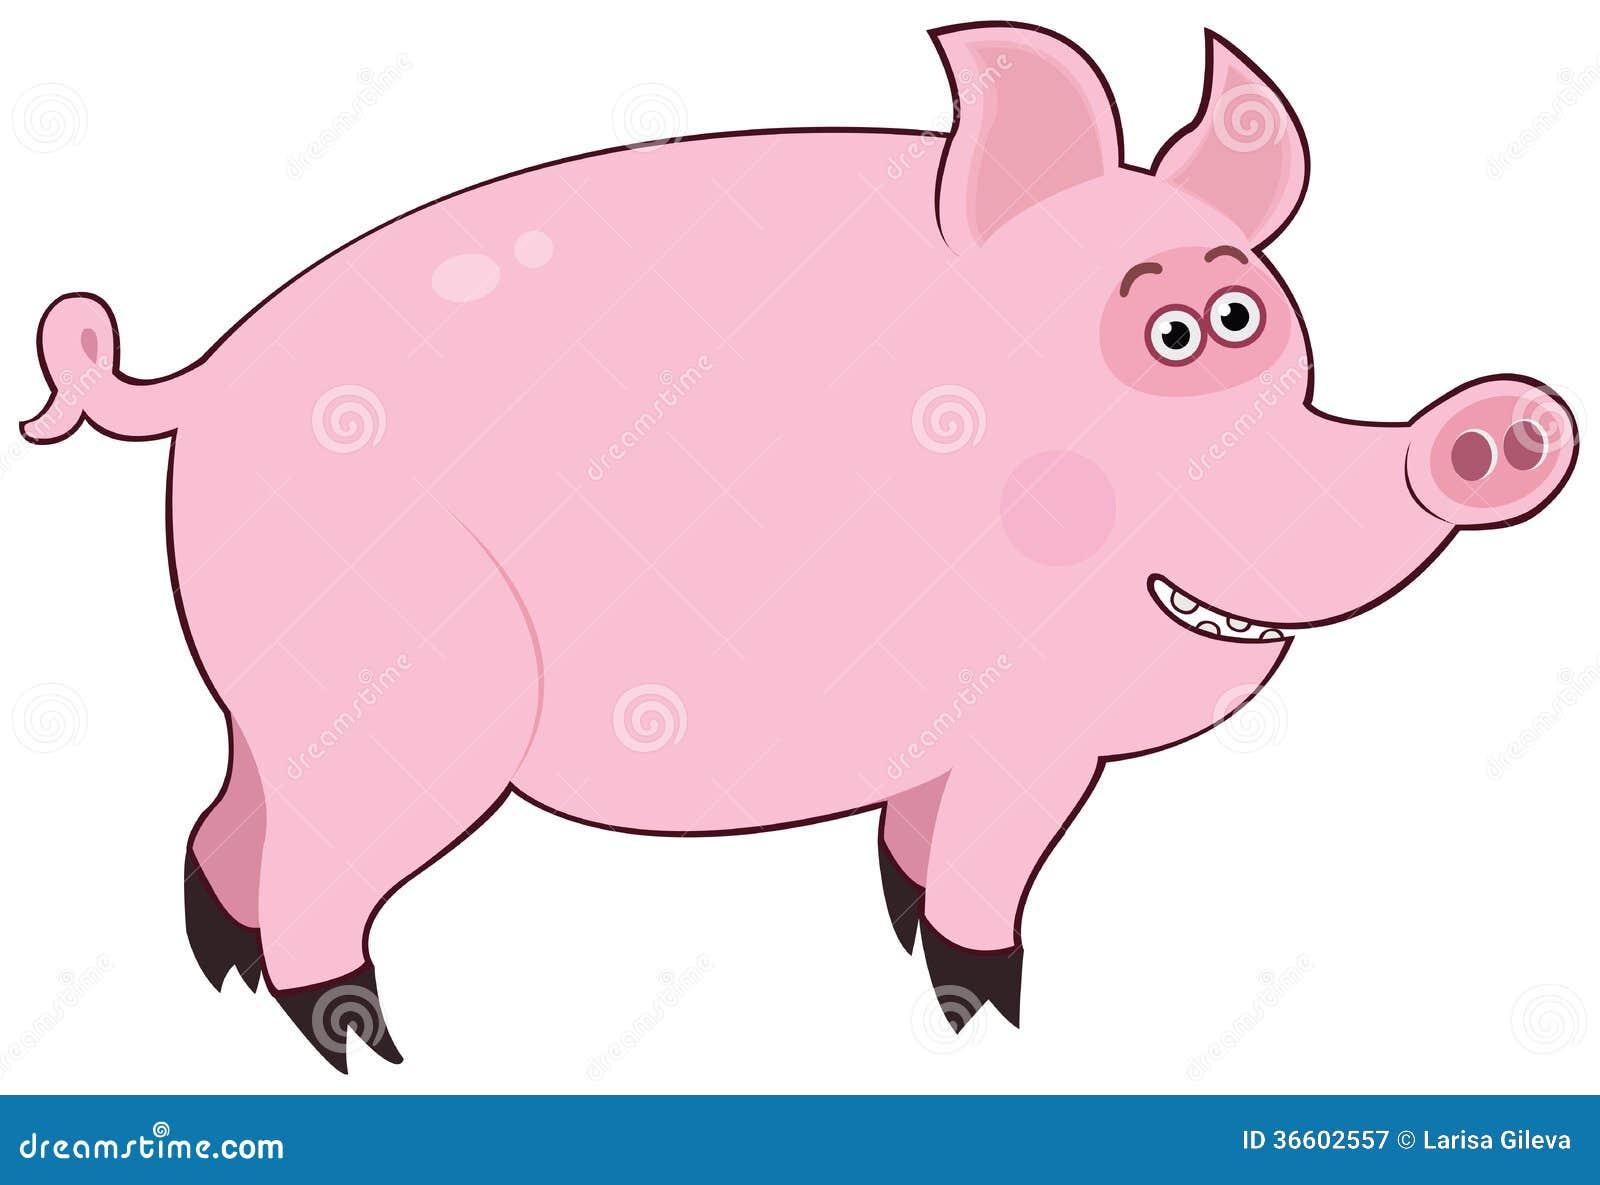 Pig Feet Stock Illustrations 177 Pig Feet Stock Illustrations Vectors Clipart Dreamstime